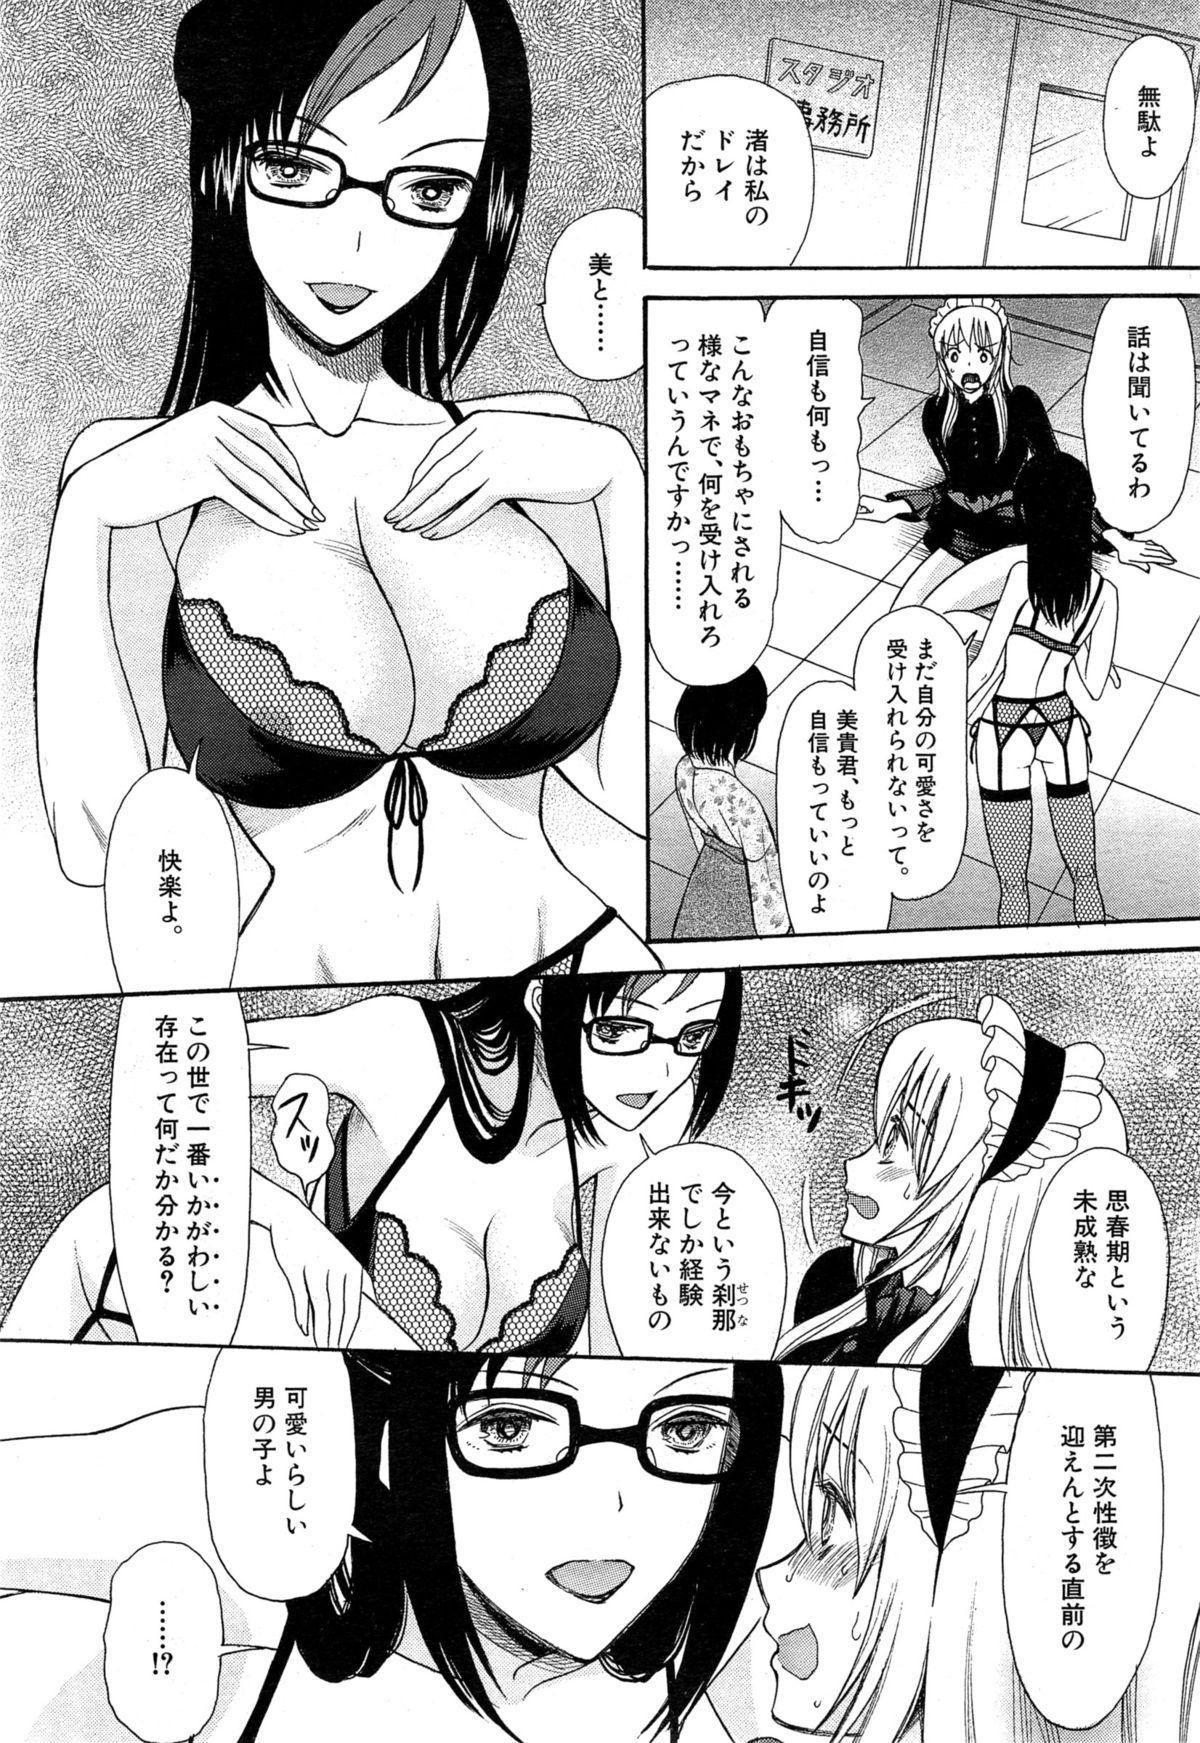 Kawaiku Natte Omocha ni Natte 65